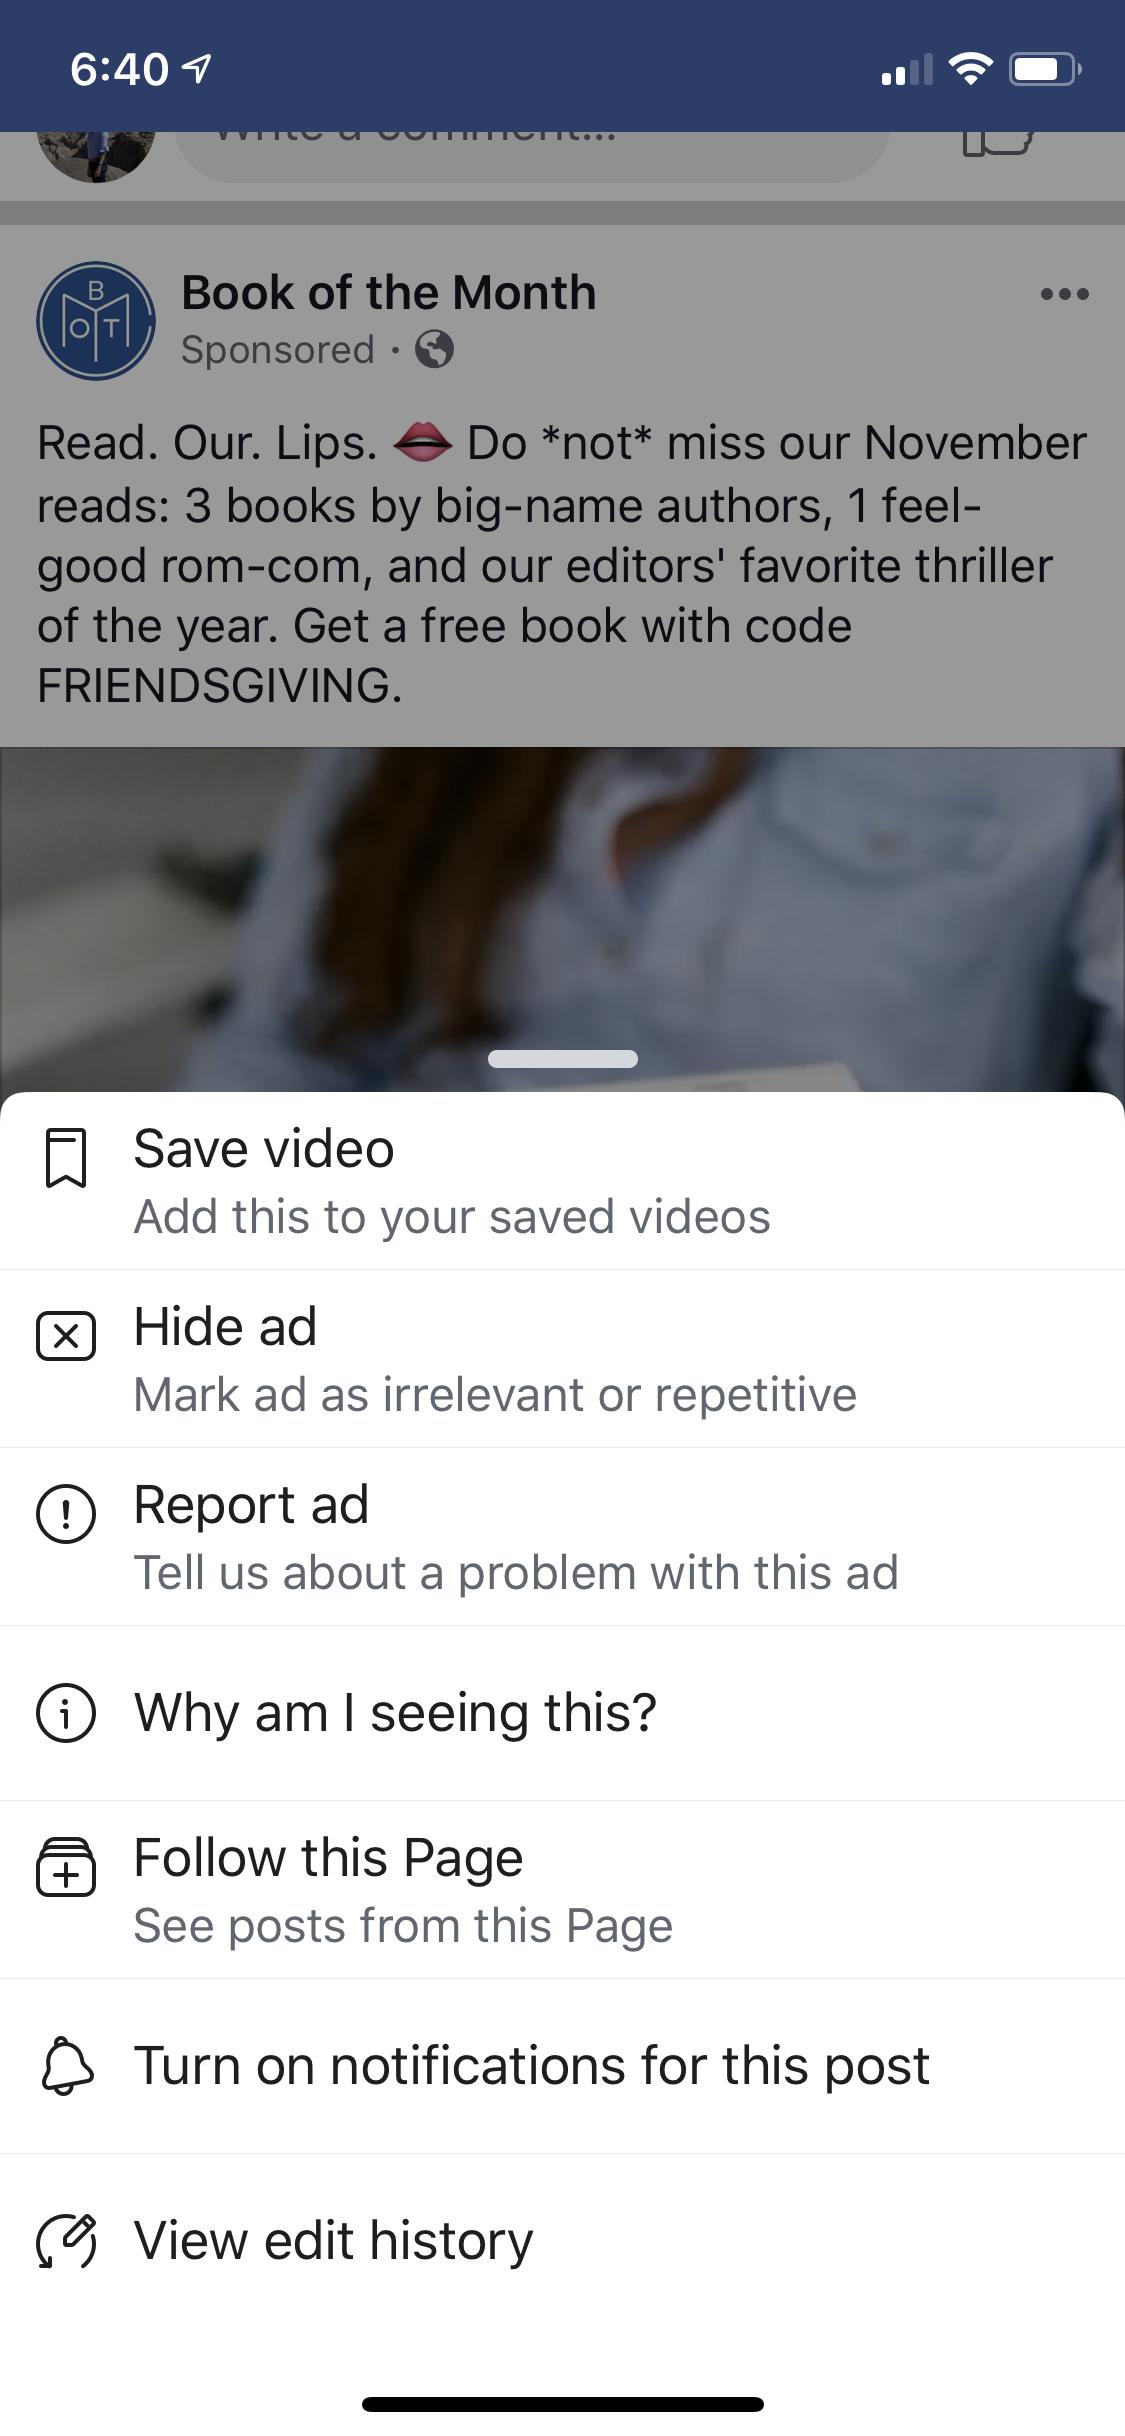 Facebook更多与广告相关的按钮